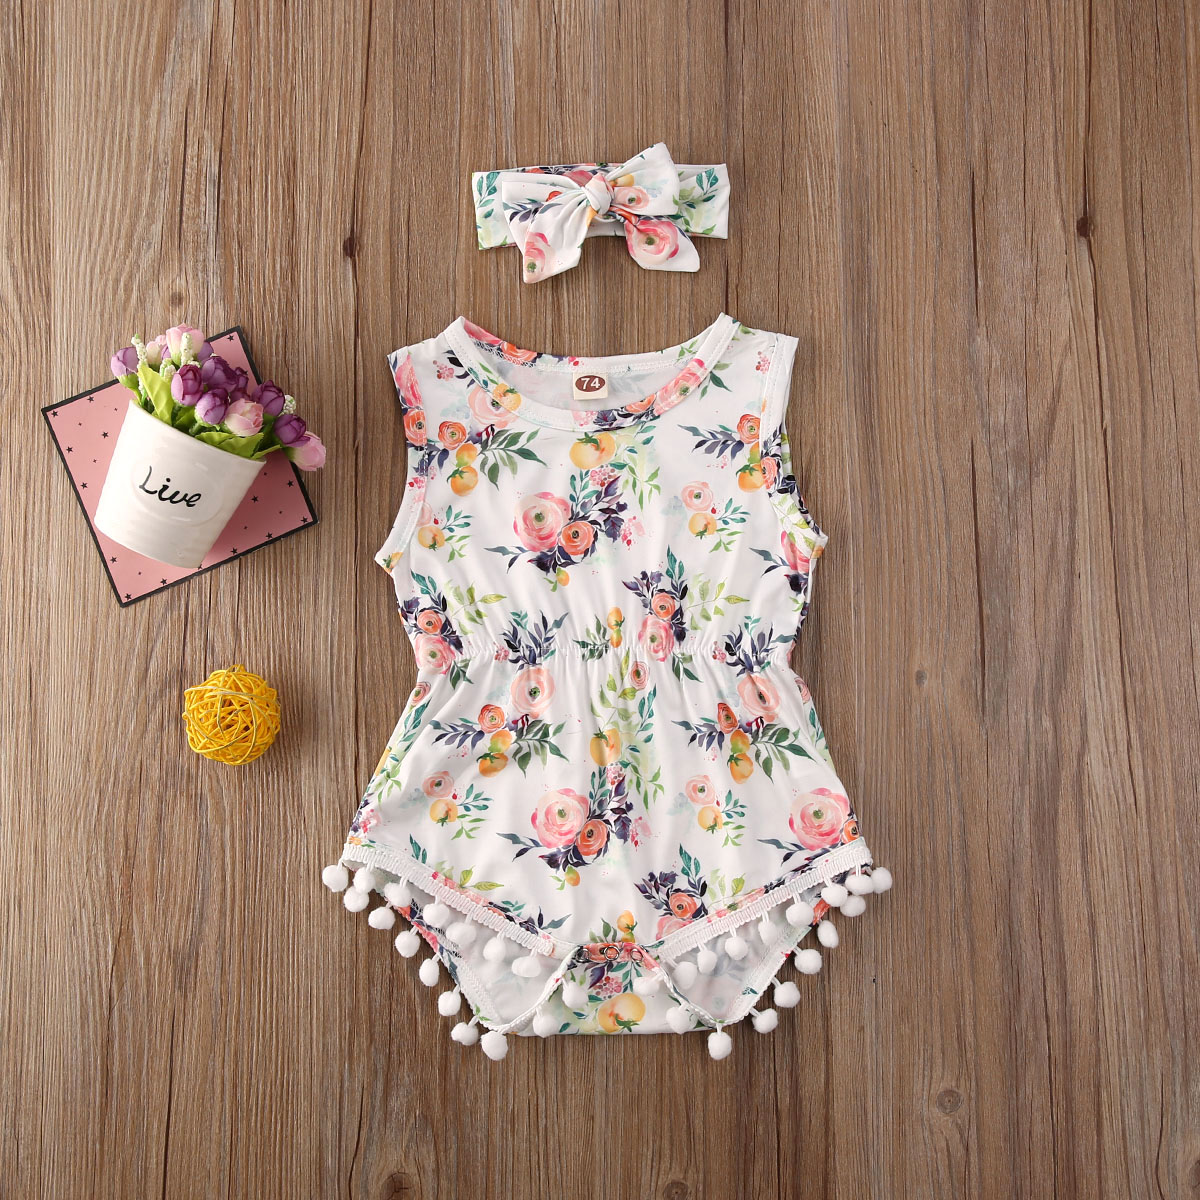 Pudcoco Newborn Baby Girl Clothes Flower Print Sleeveless Tassel Romper Jumpsuit Headband 2Pcs Outfits Cotton Clothes Set